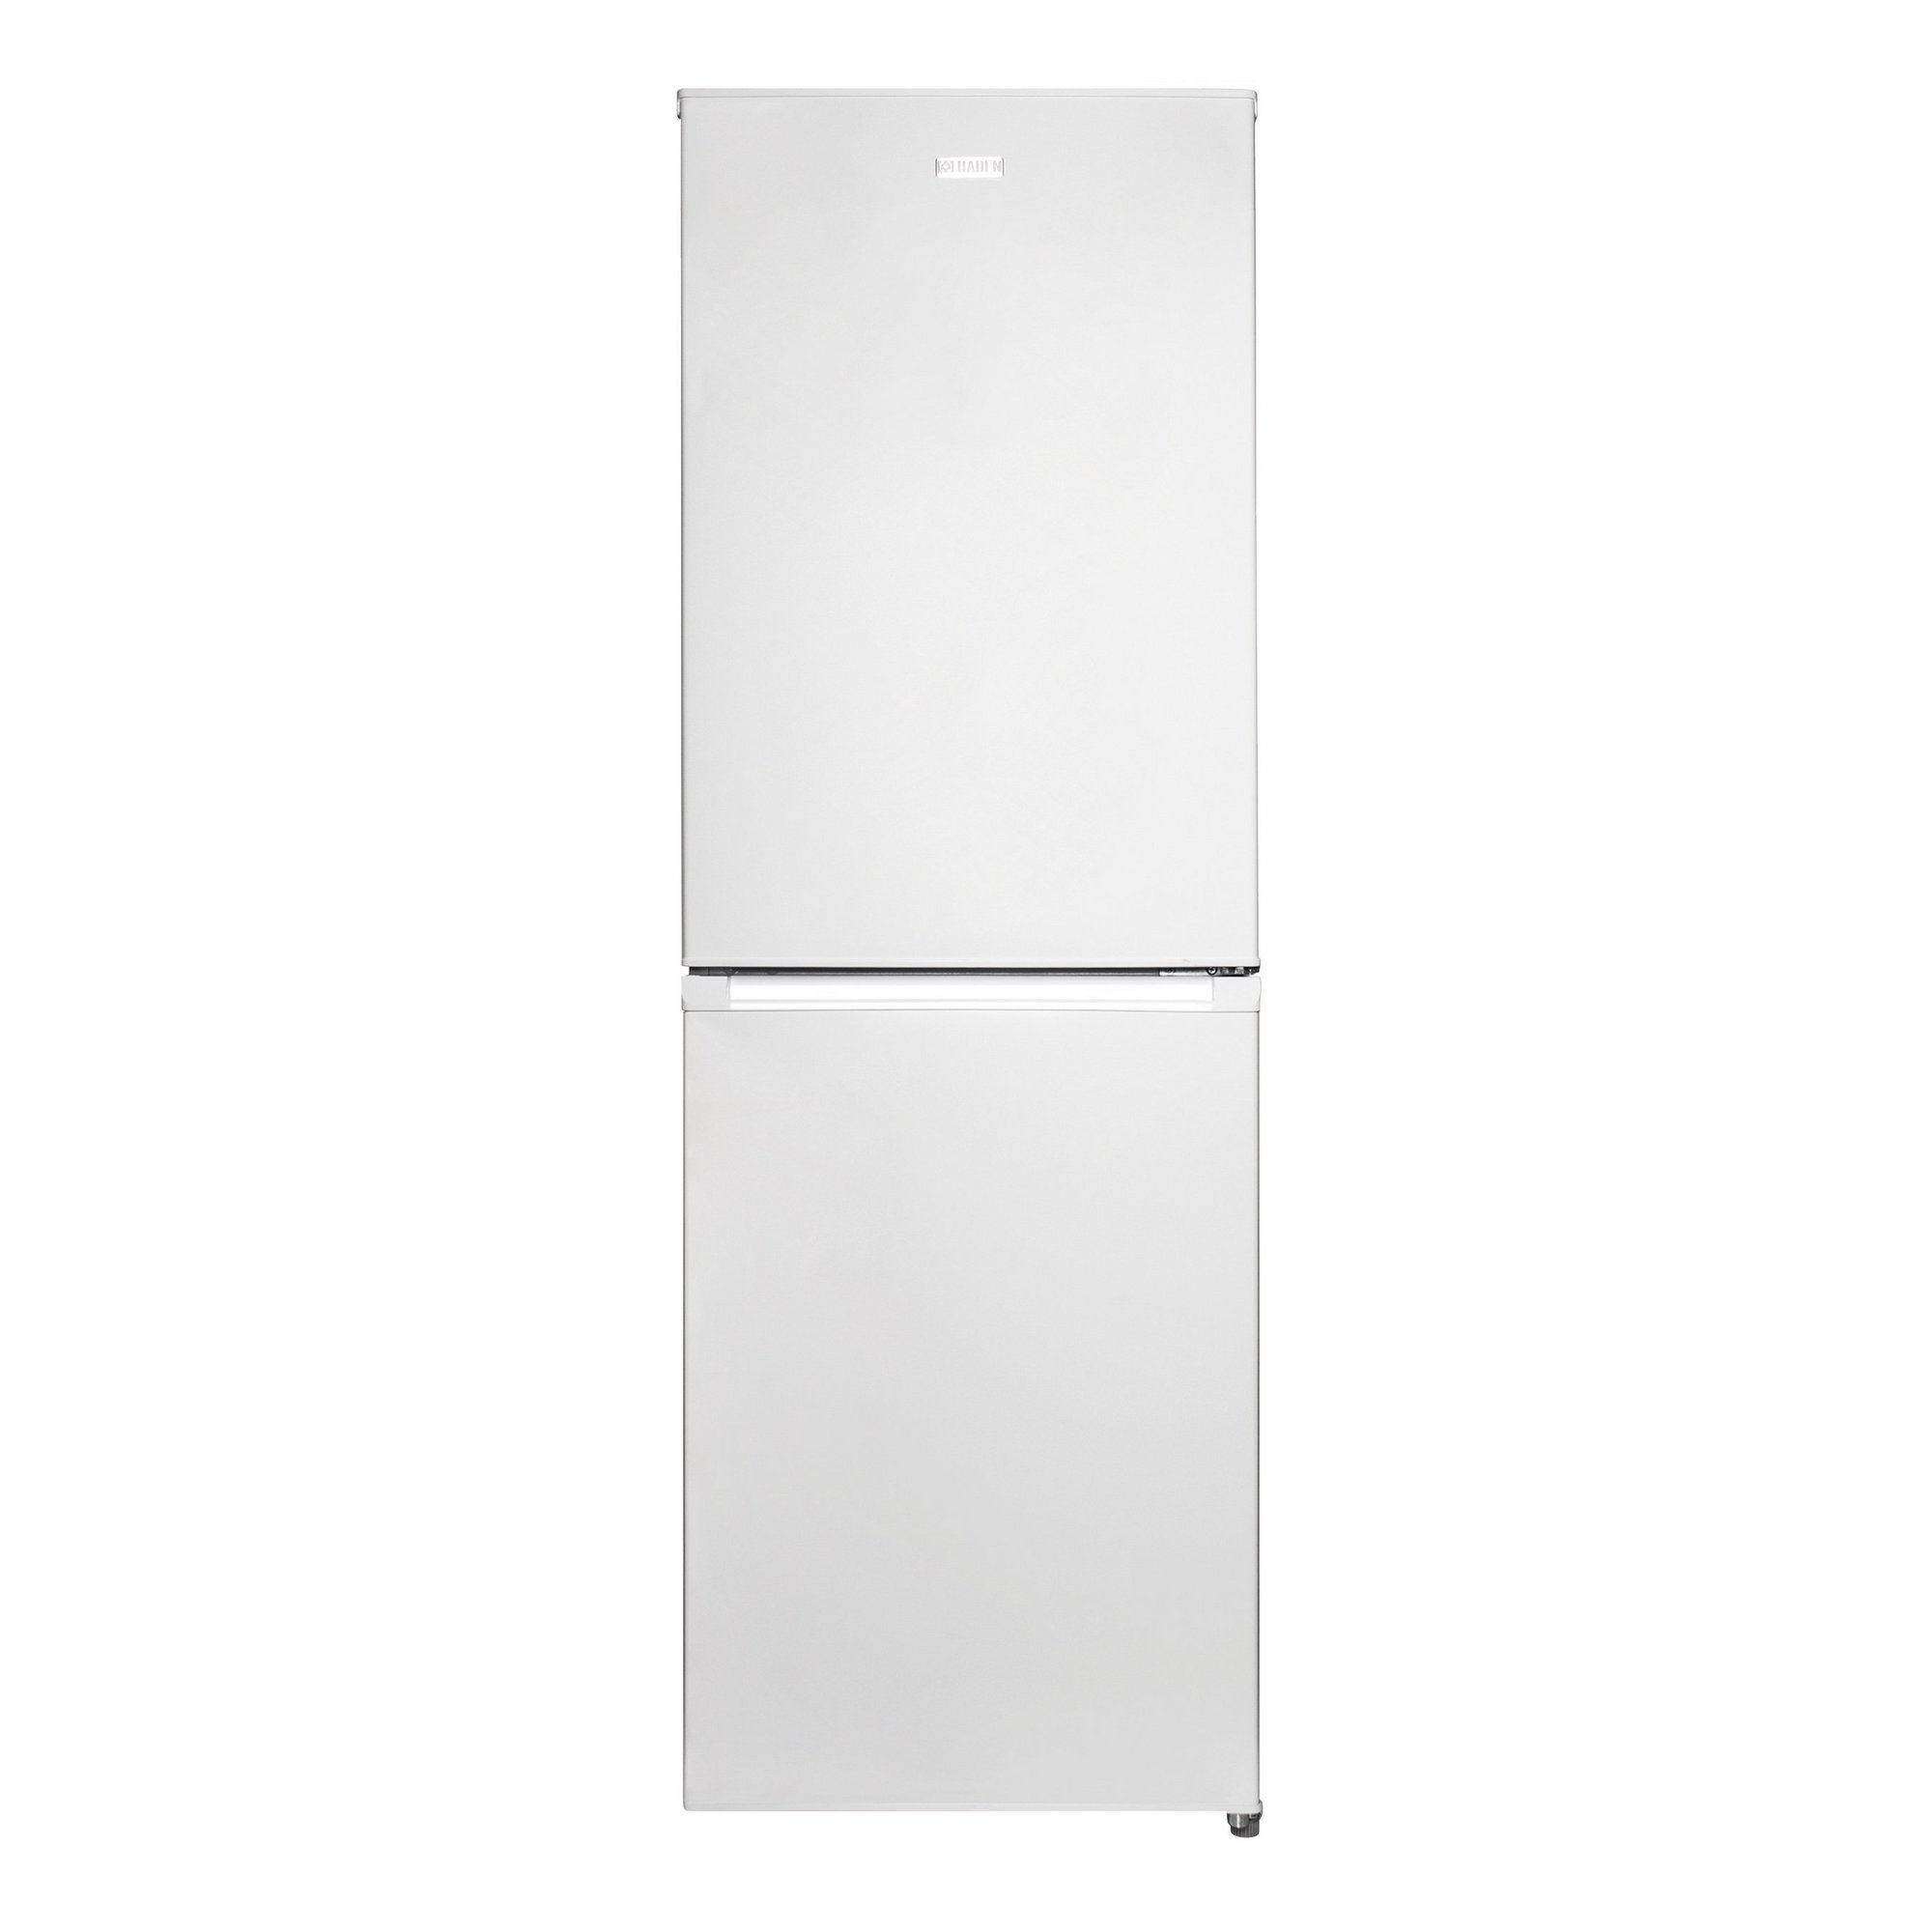 Image of Haden 50cm Frost Free Fridge Freezer